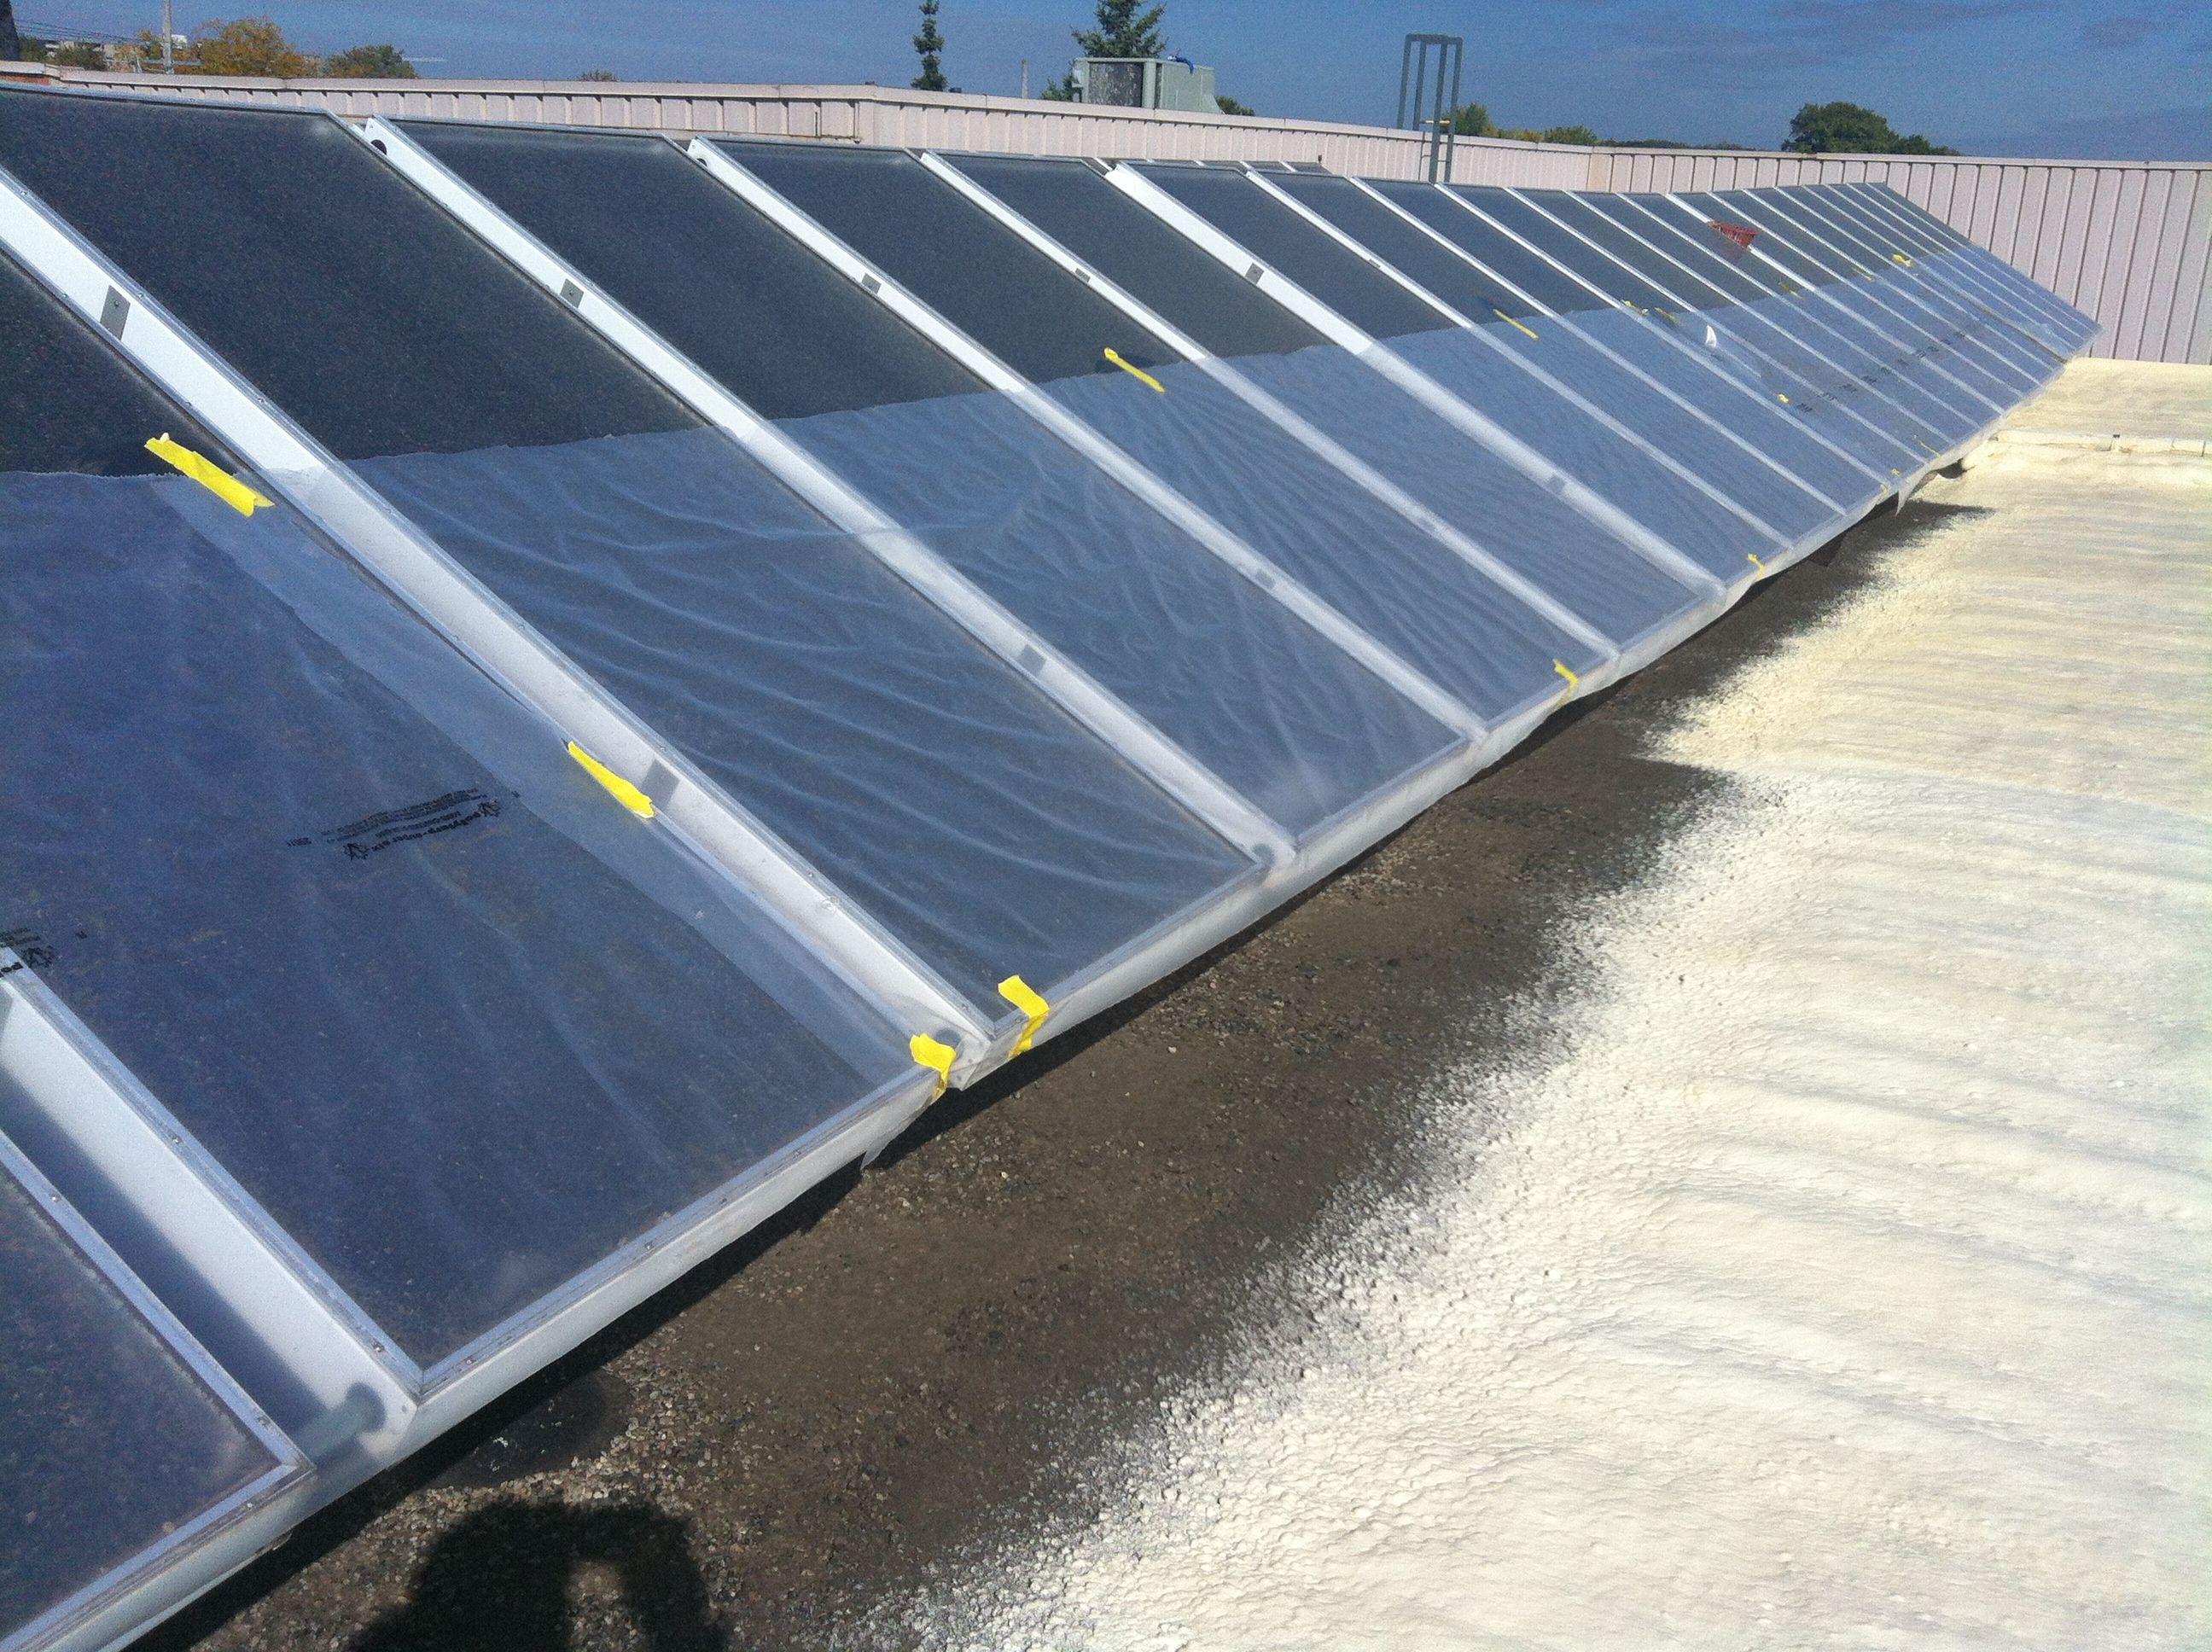 3lb Polyurethane Roofing Foam With Elastomeric Protective